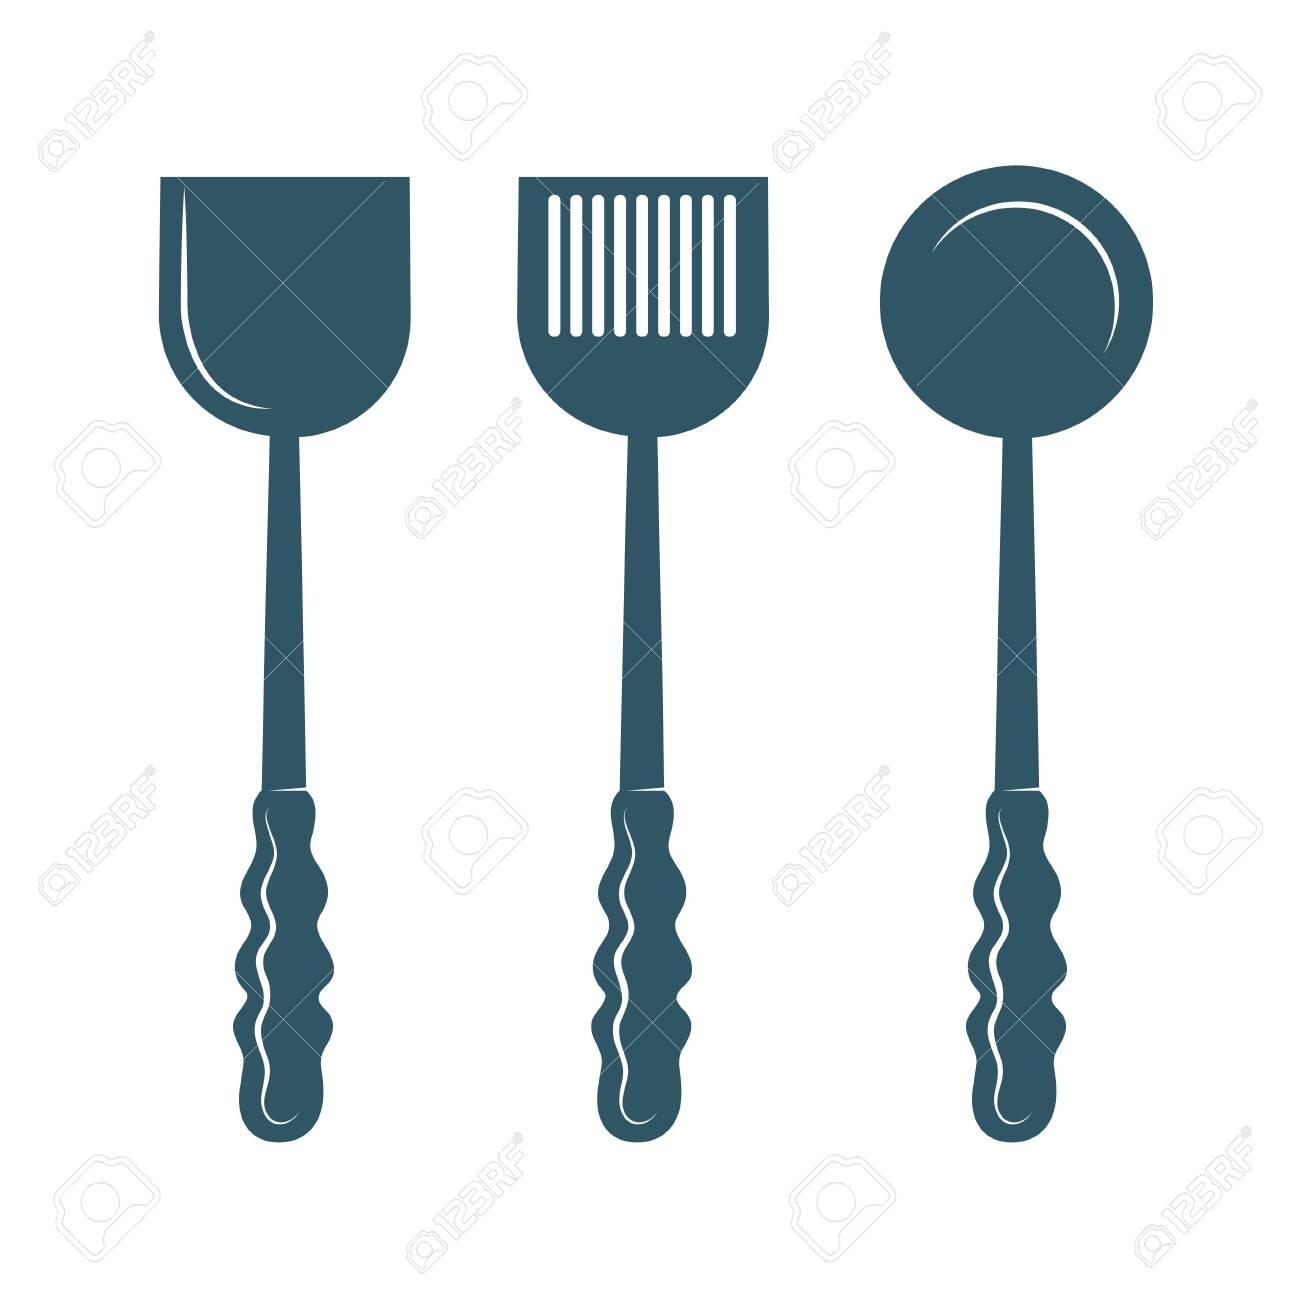 kitchen utensils isolated on white background. - 131437427